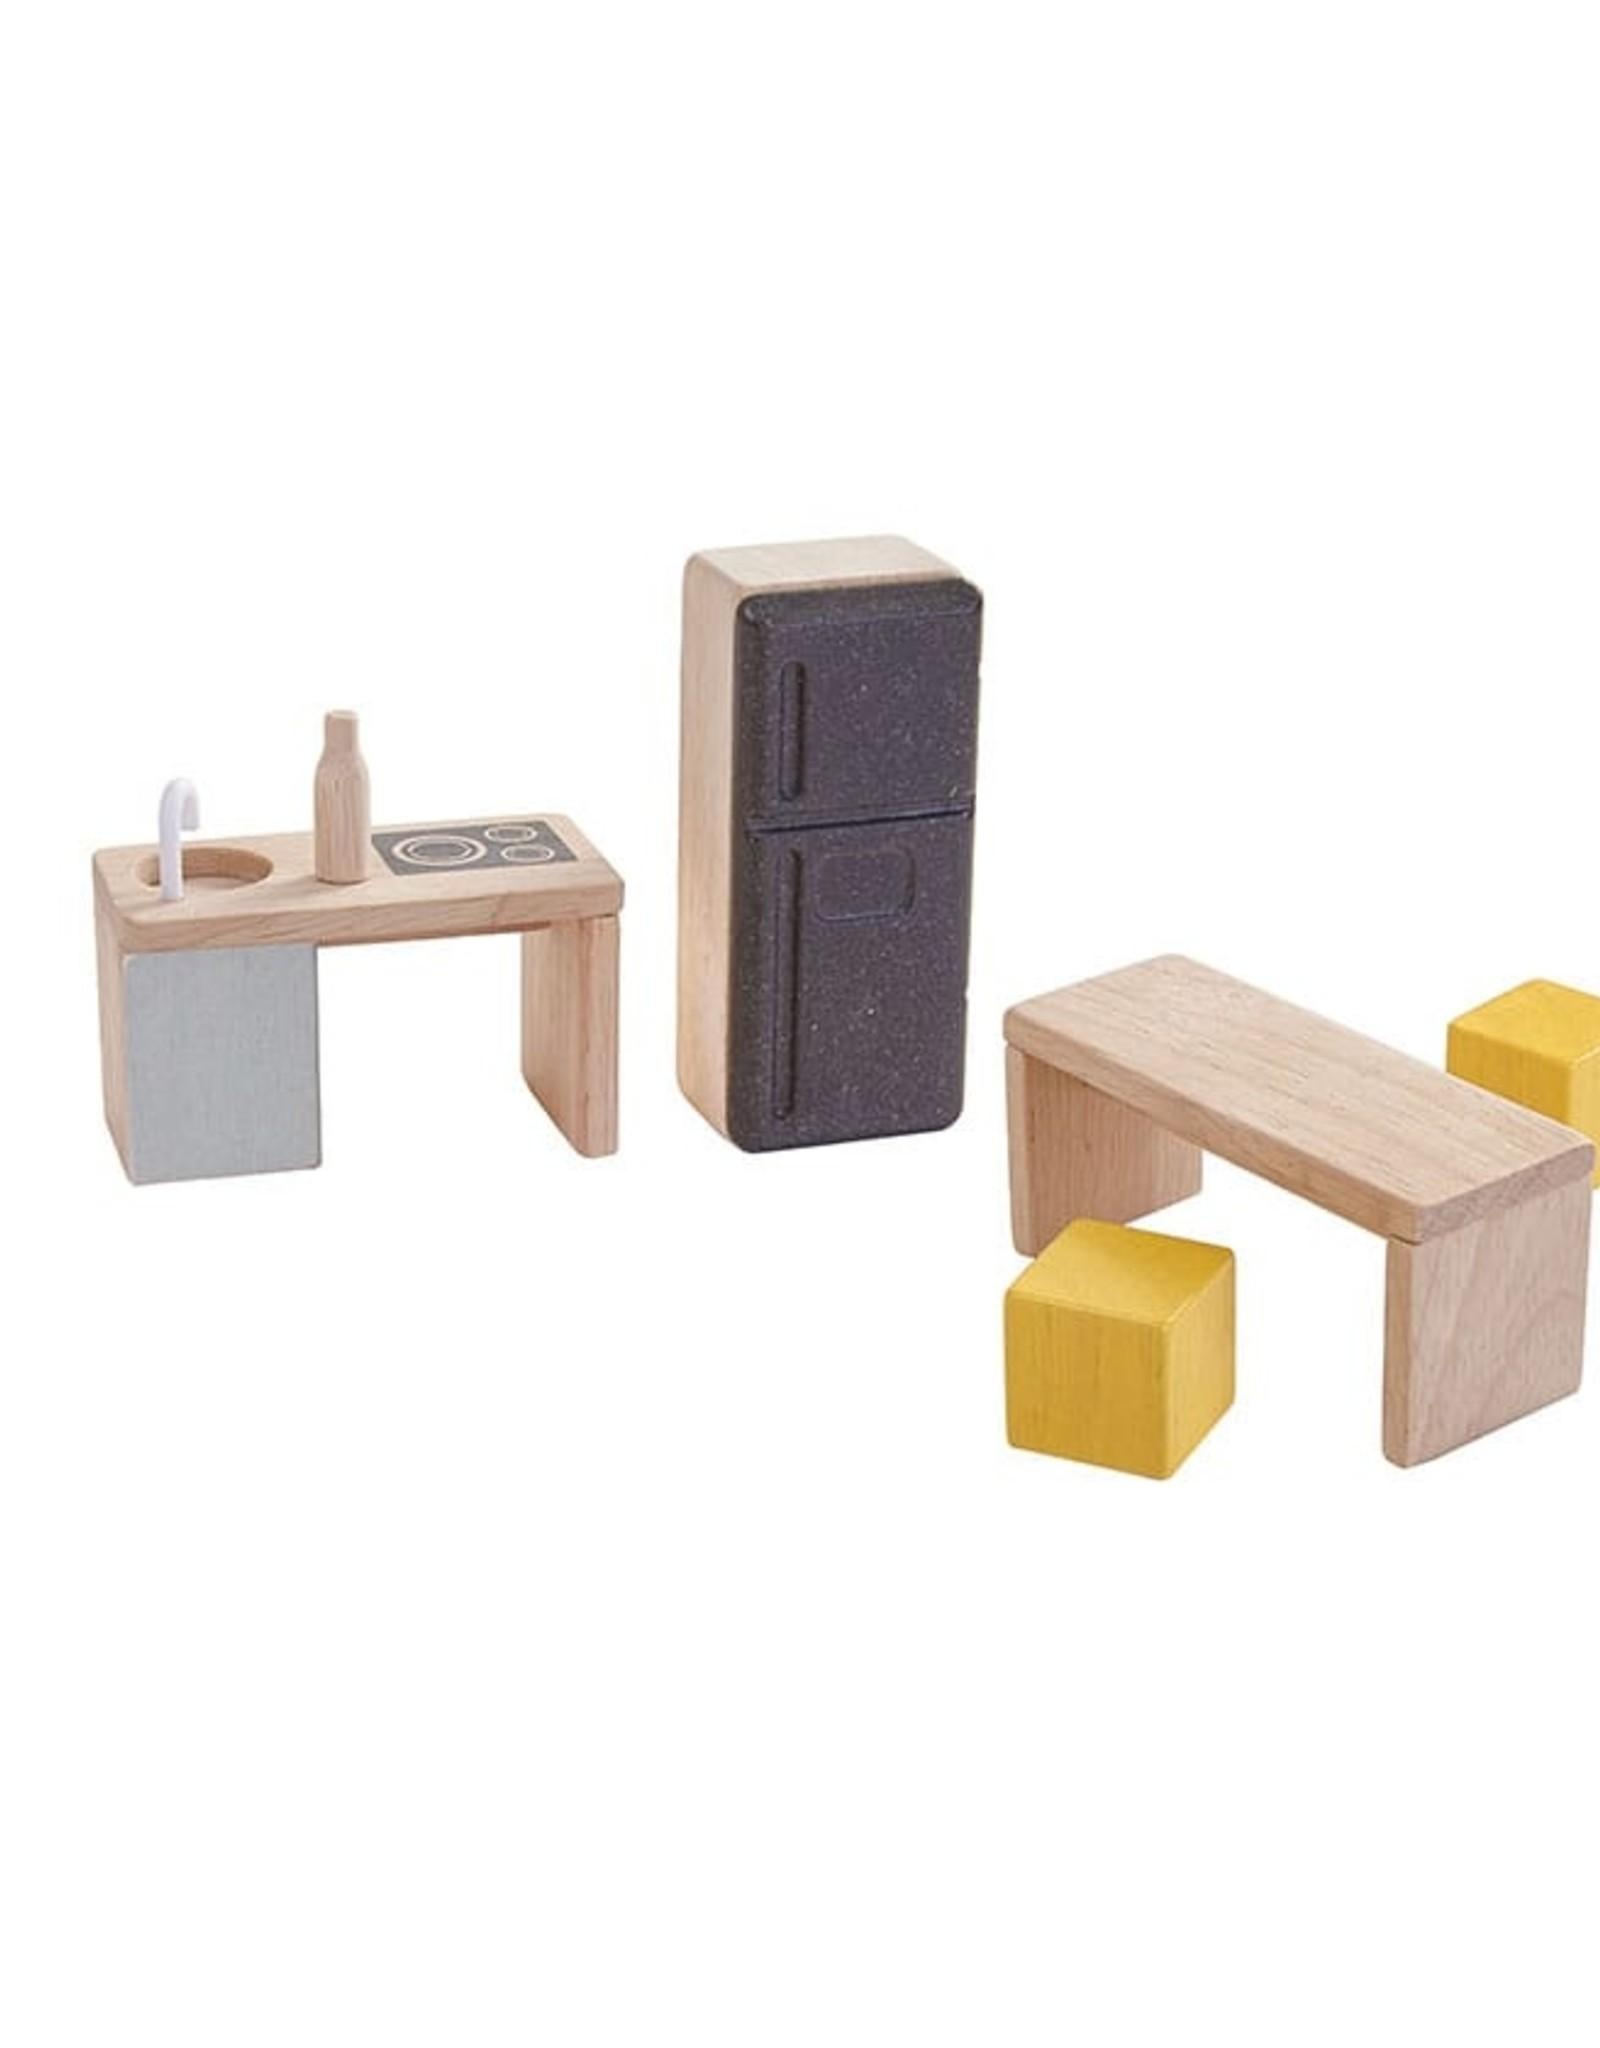 Plan Toys Slide N Go Dollhouse